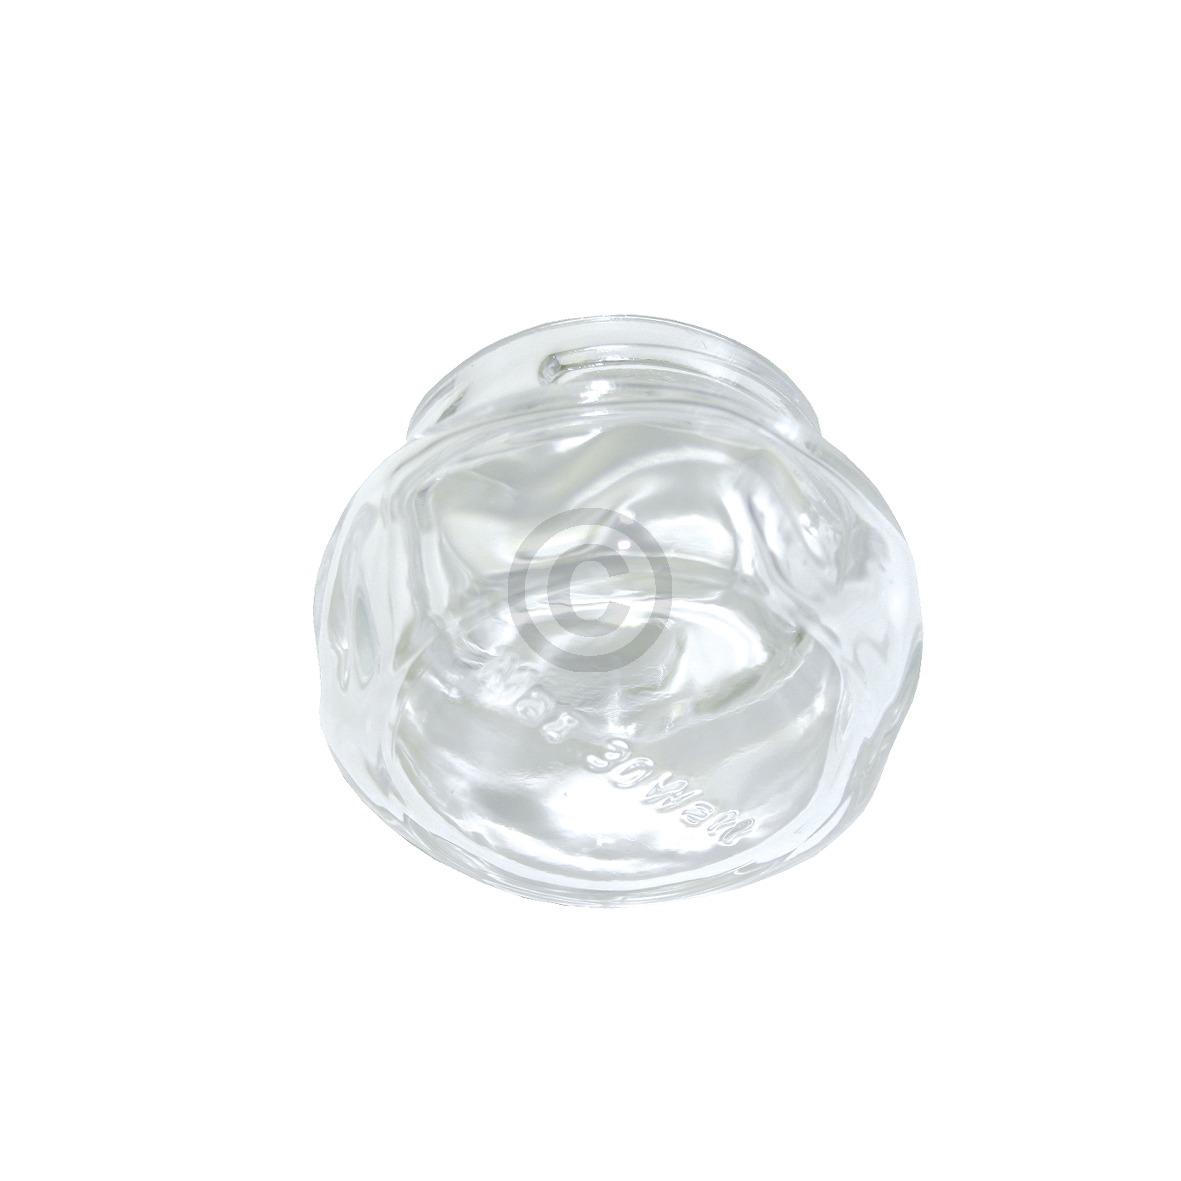 Lampenabdeckung Ø48mm, Glas 481245028007 Bauknecht, Whirlpool, Ikea